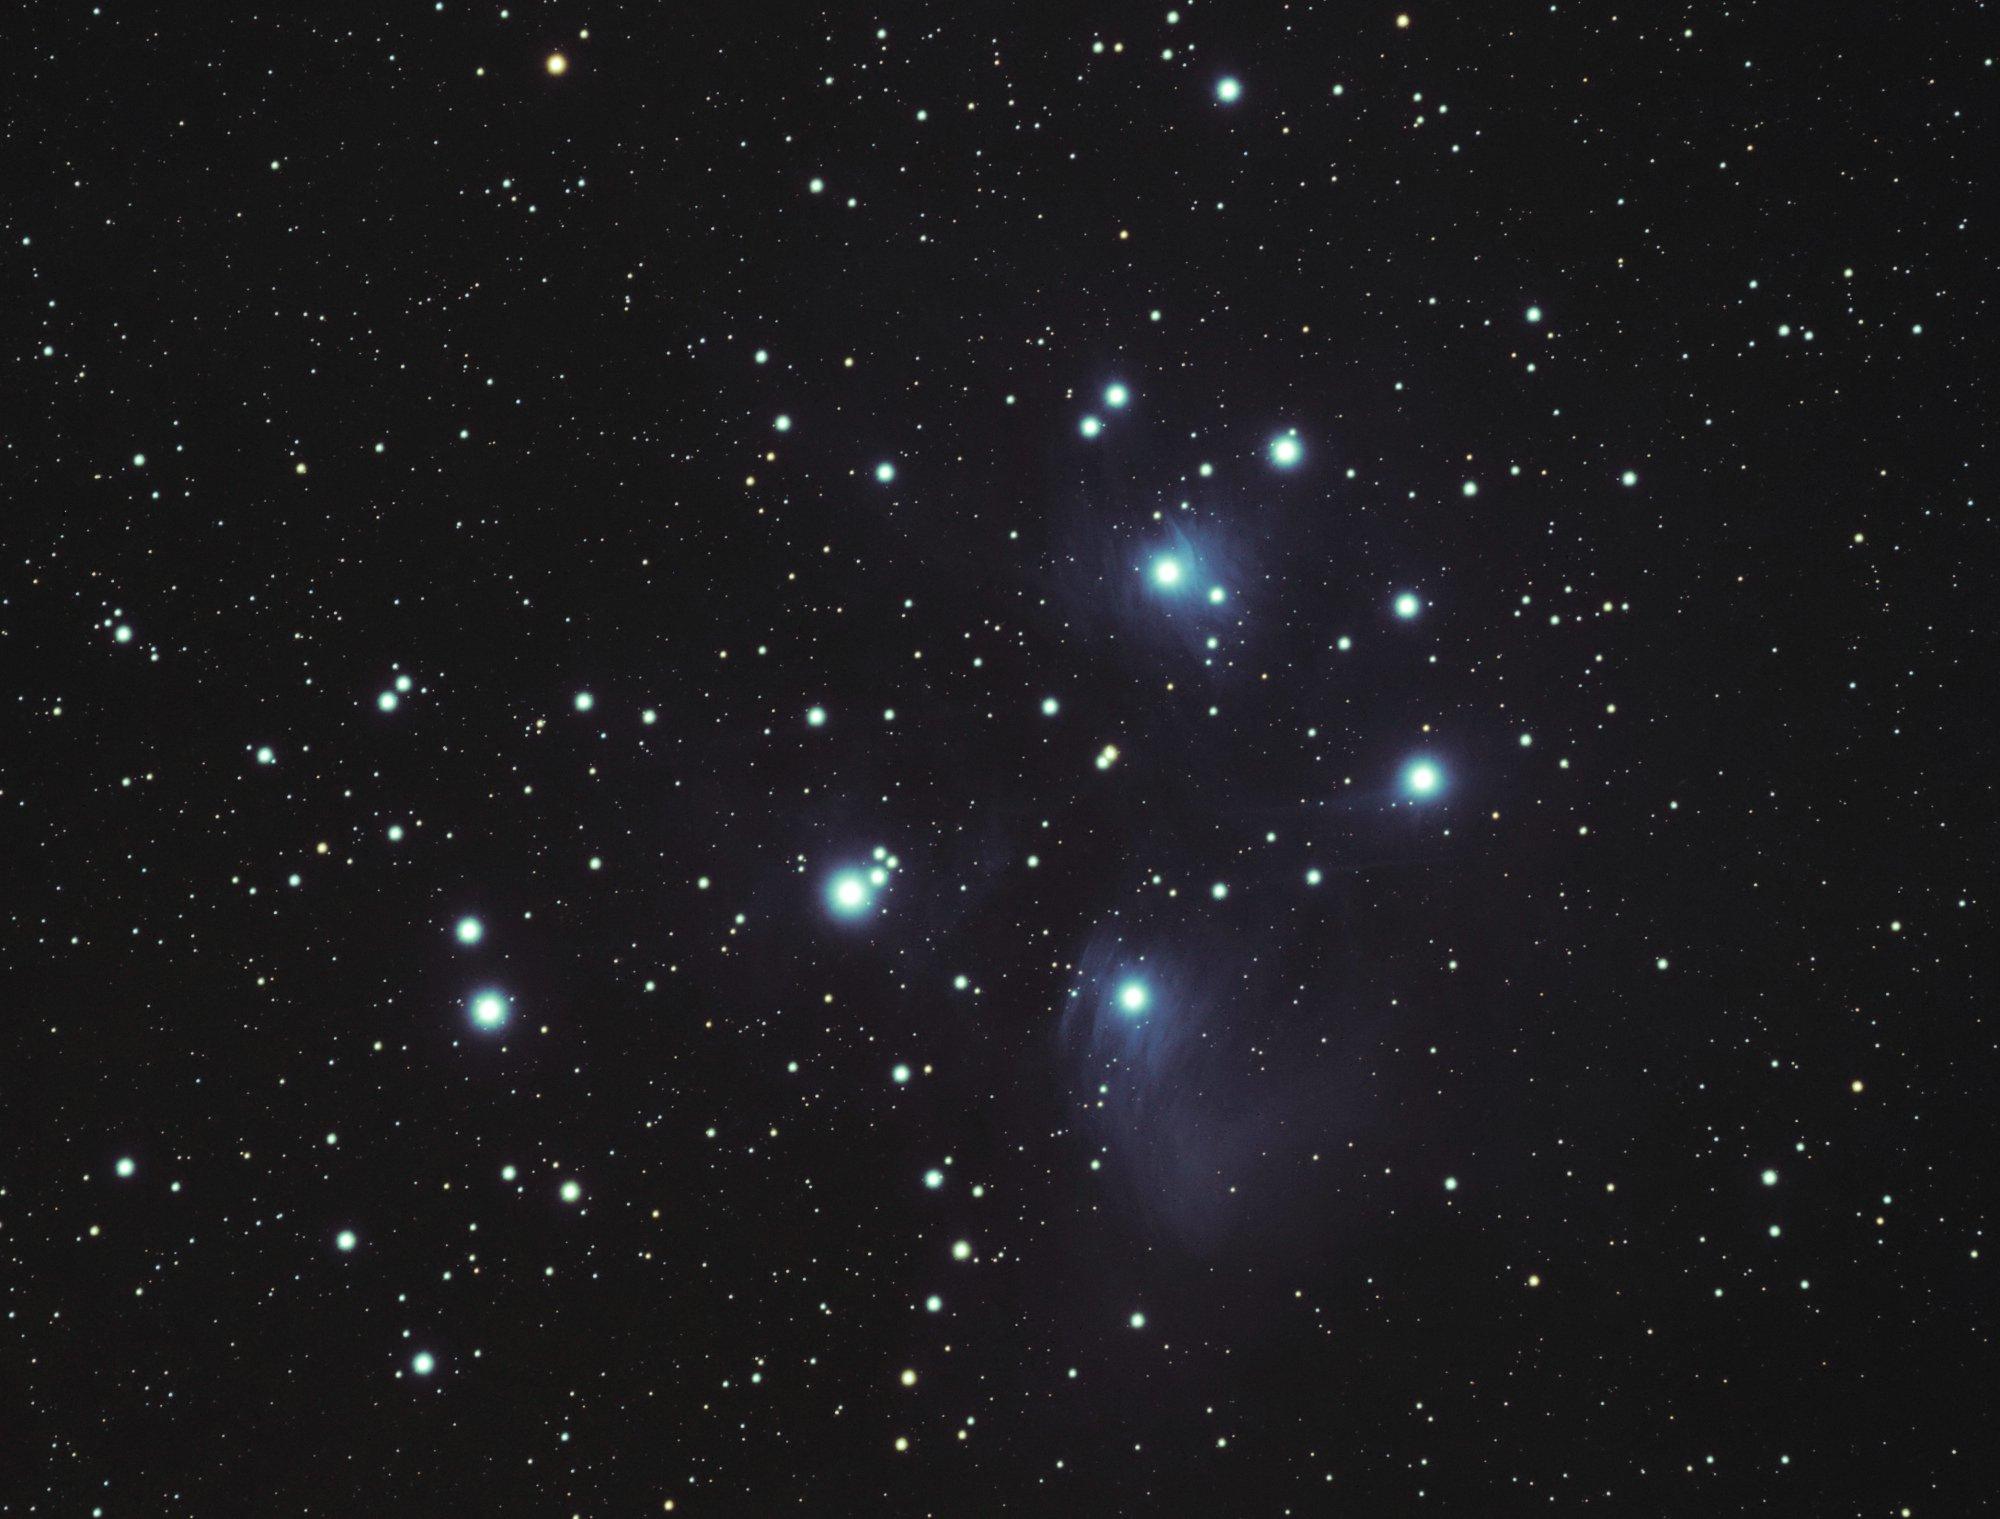 pleiades.jpg.edaa6de4410c9365d5170bb16d5465b0.jpg